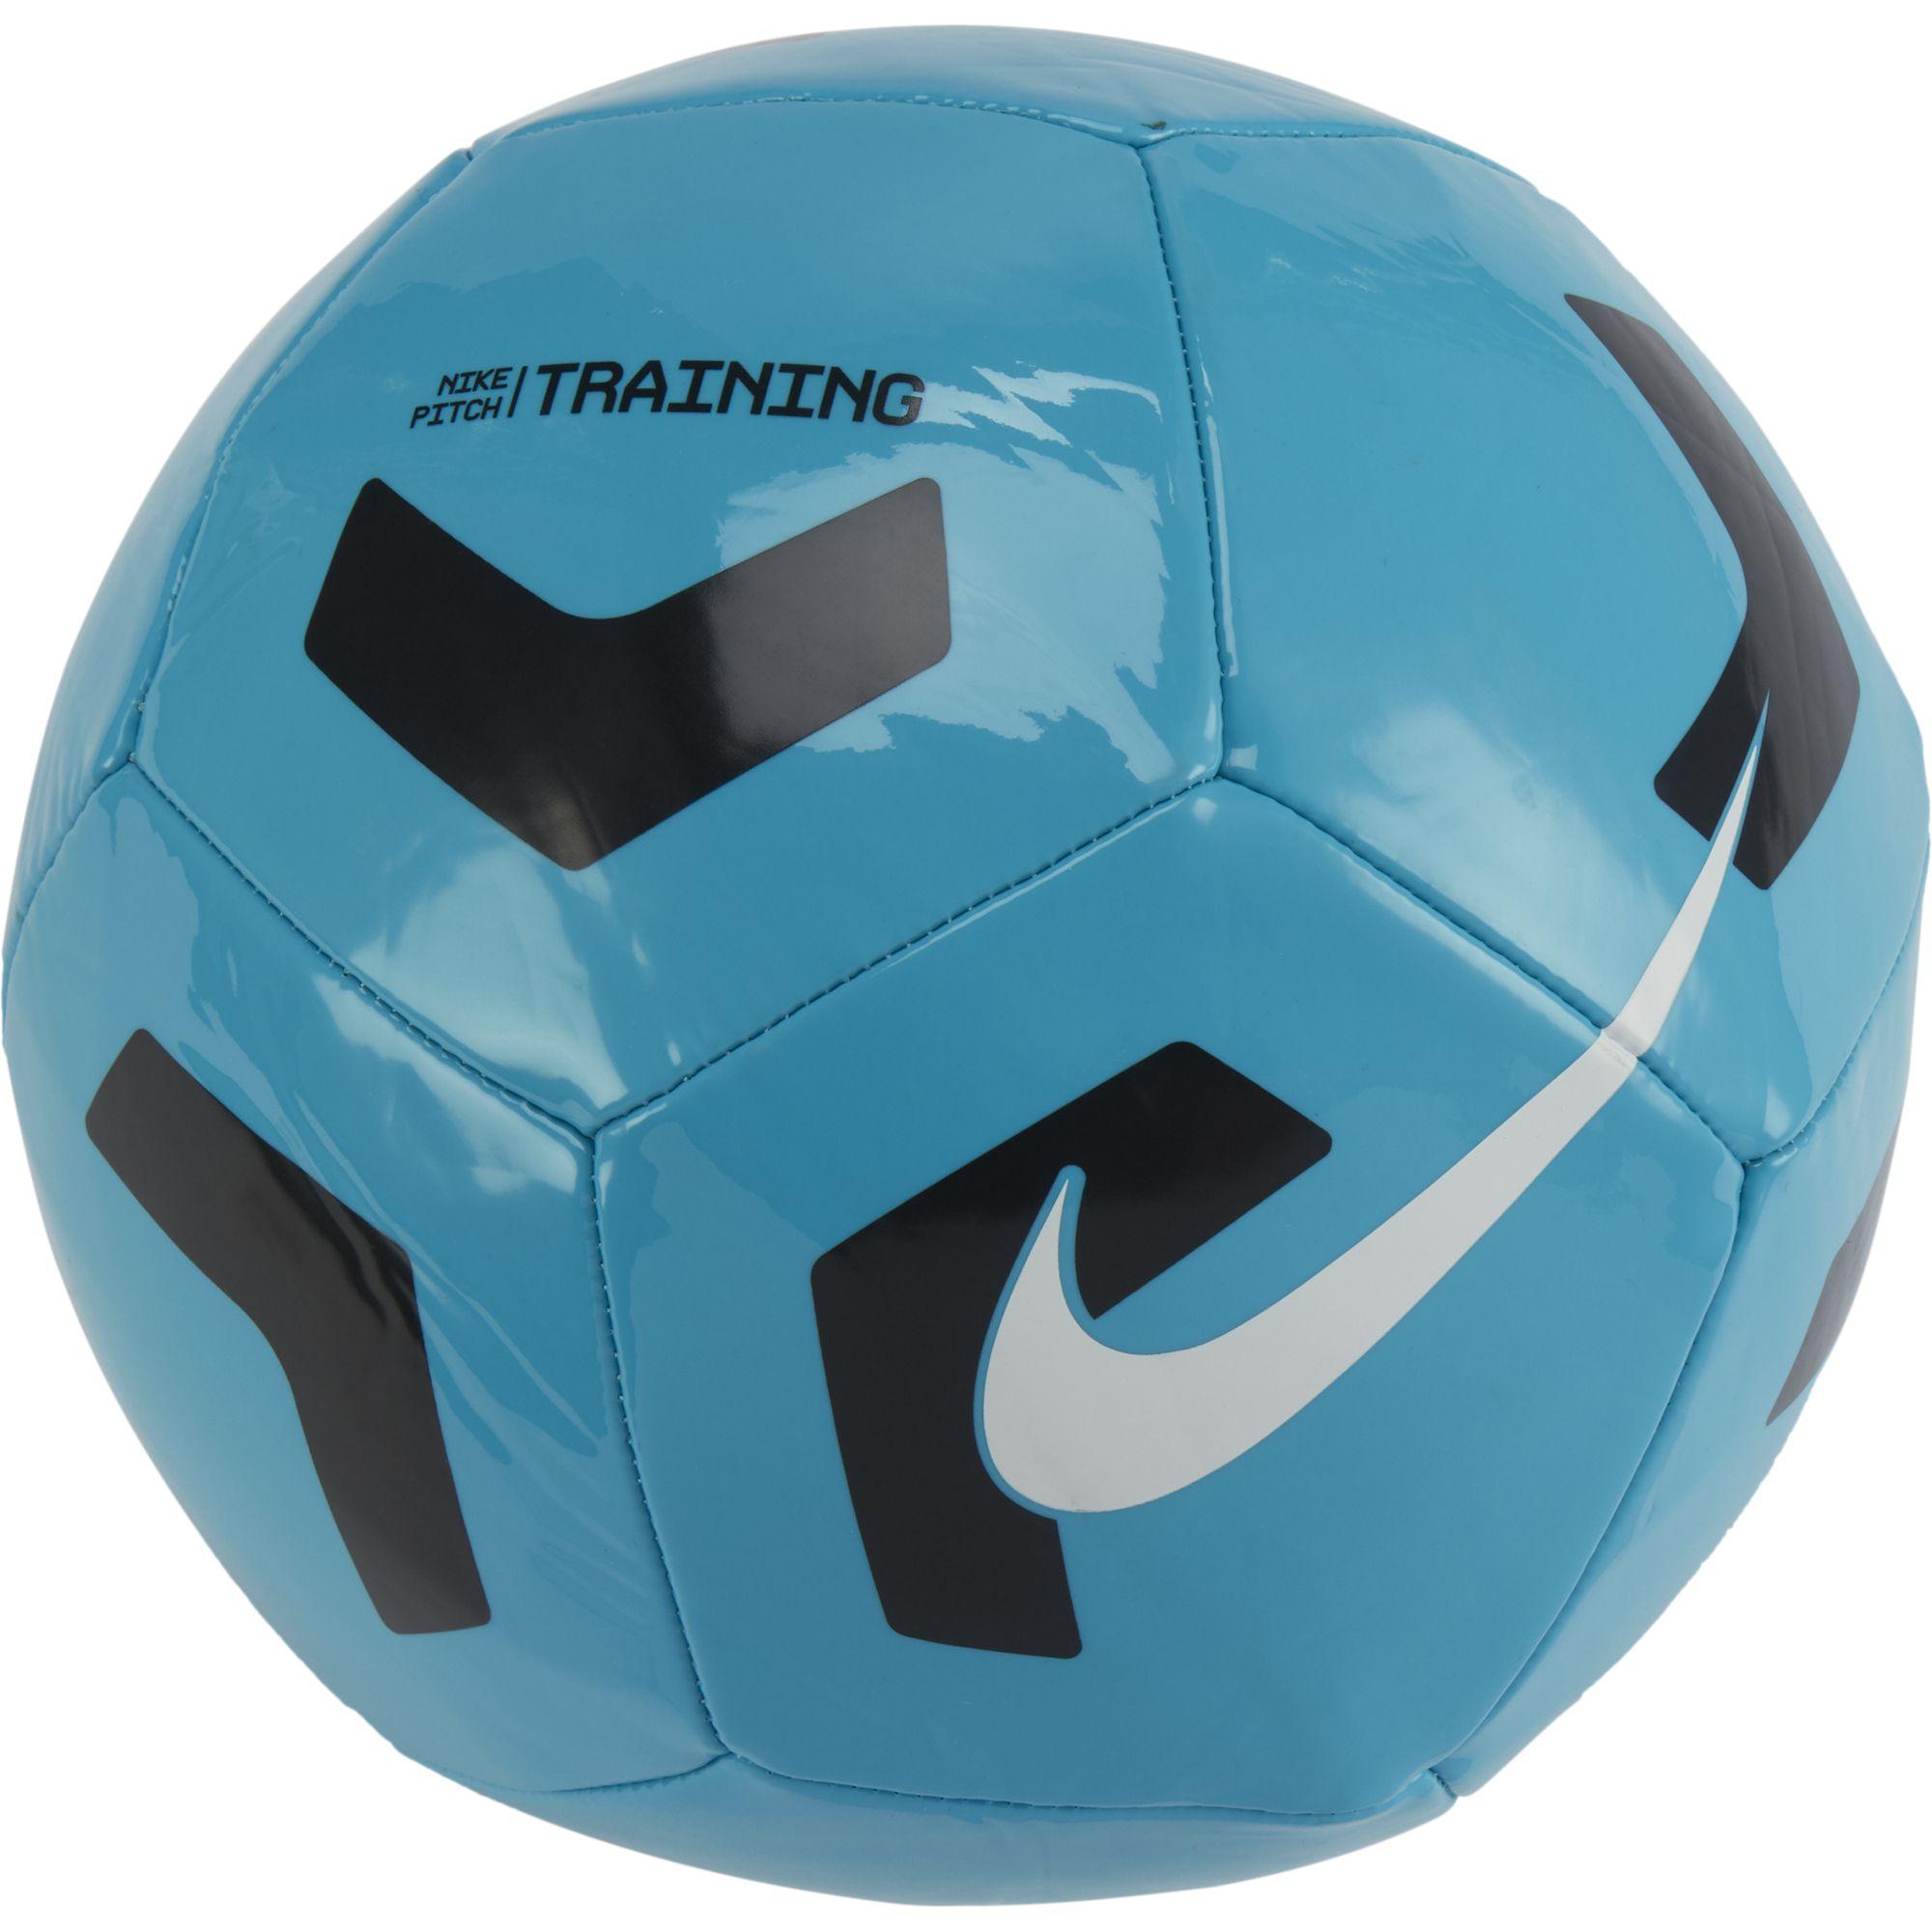 Pitch Training Soccer Ball, Lt Blue,Powder,Sky Blue, swatch